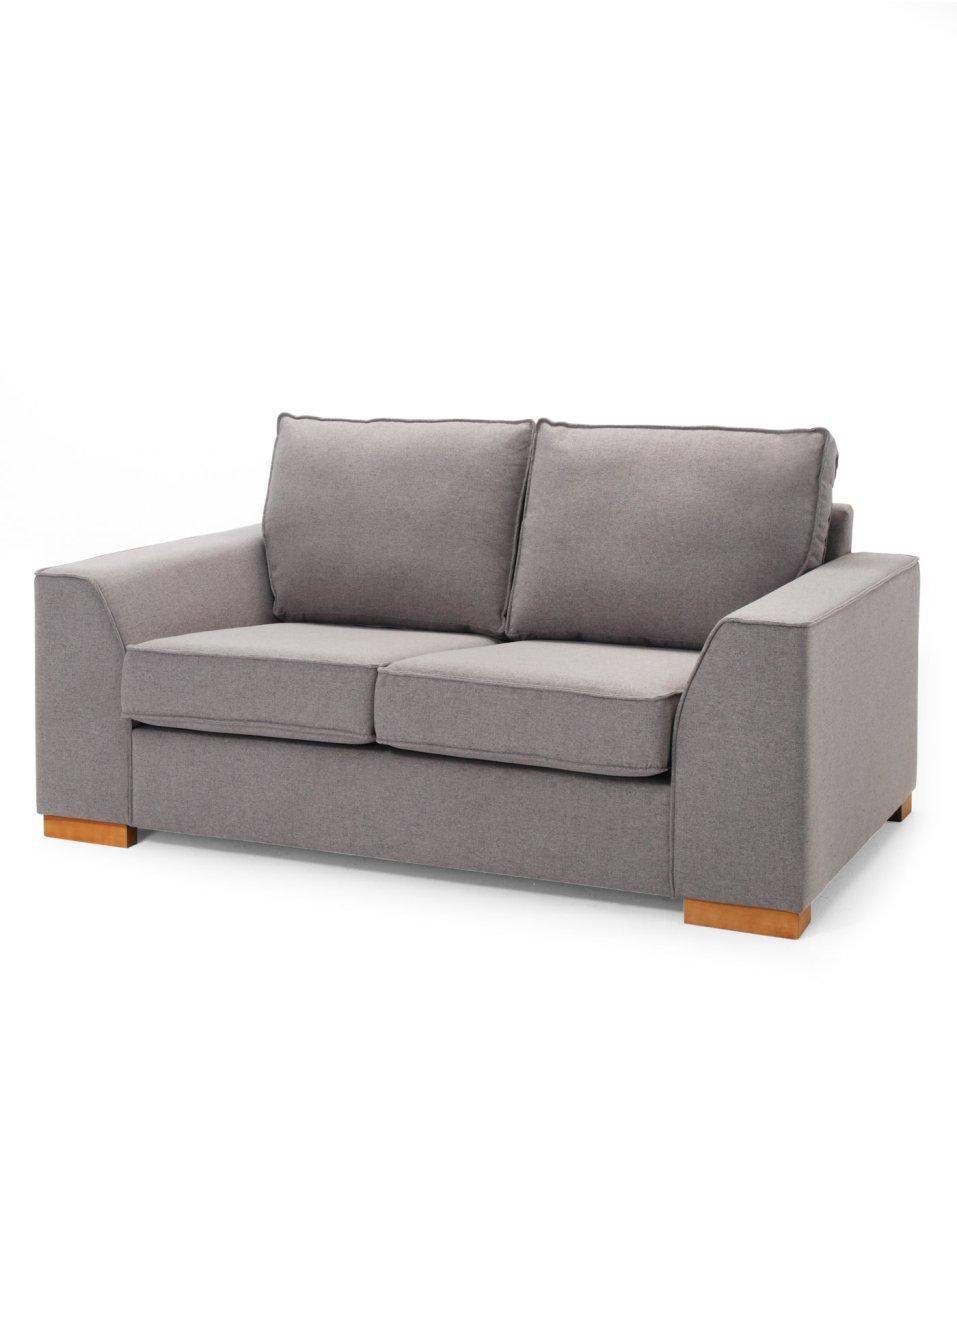 2 sitzer sofa butterfly grau bpc living online bestellen. Black Bedroom Furniture Sets. Home Design Ideas